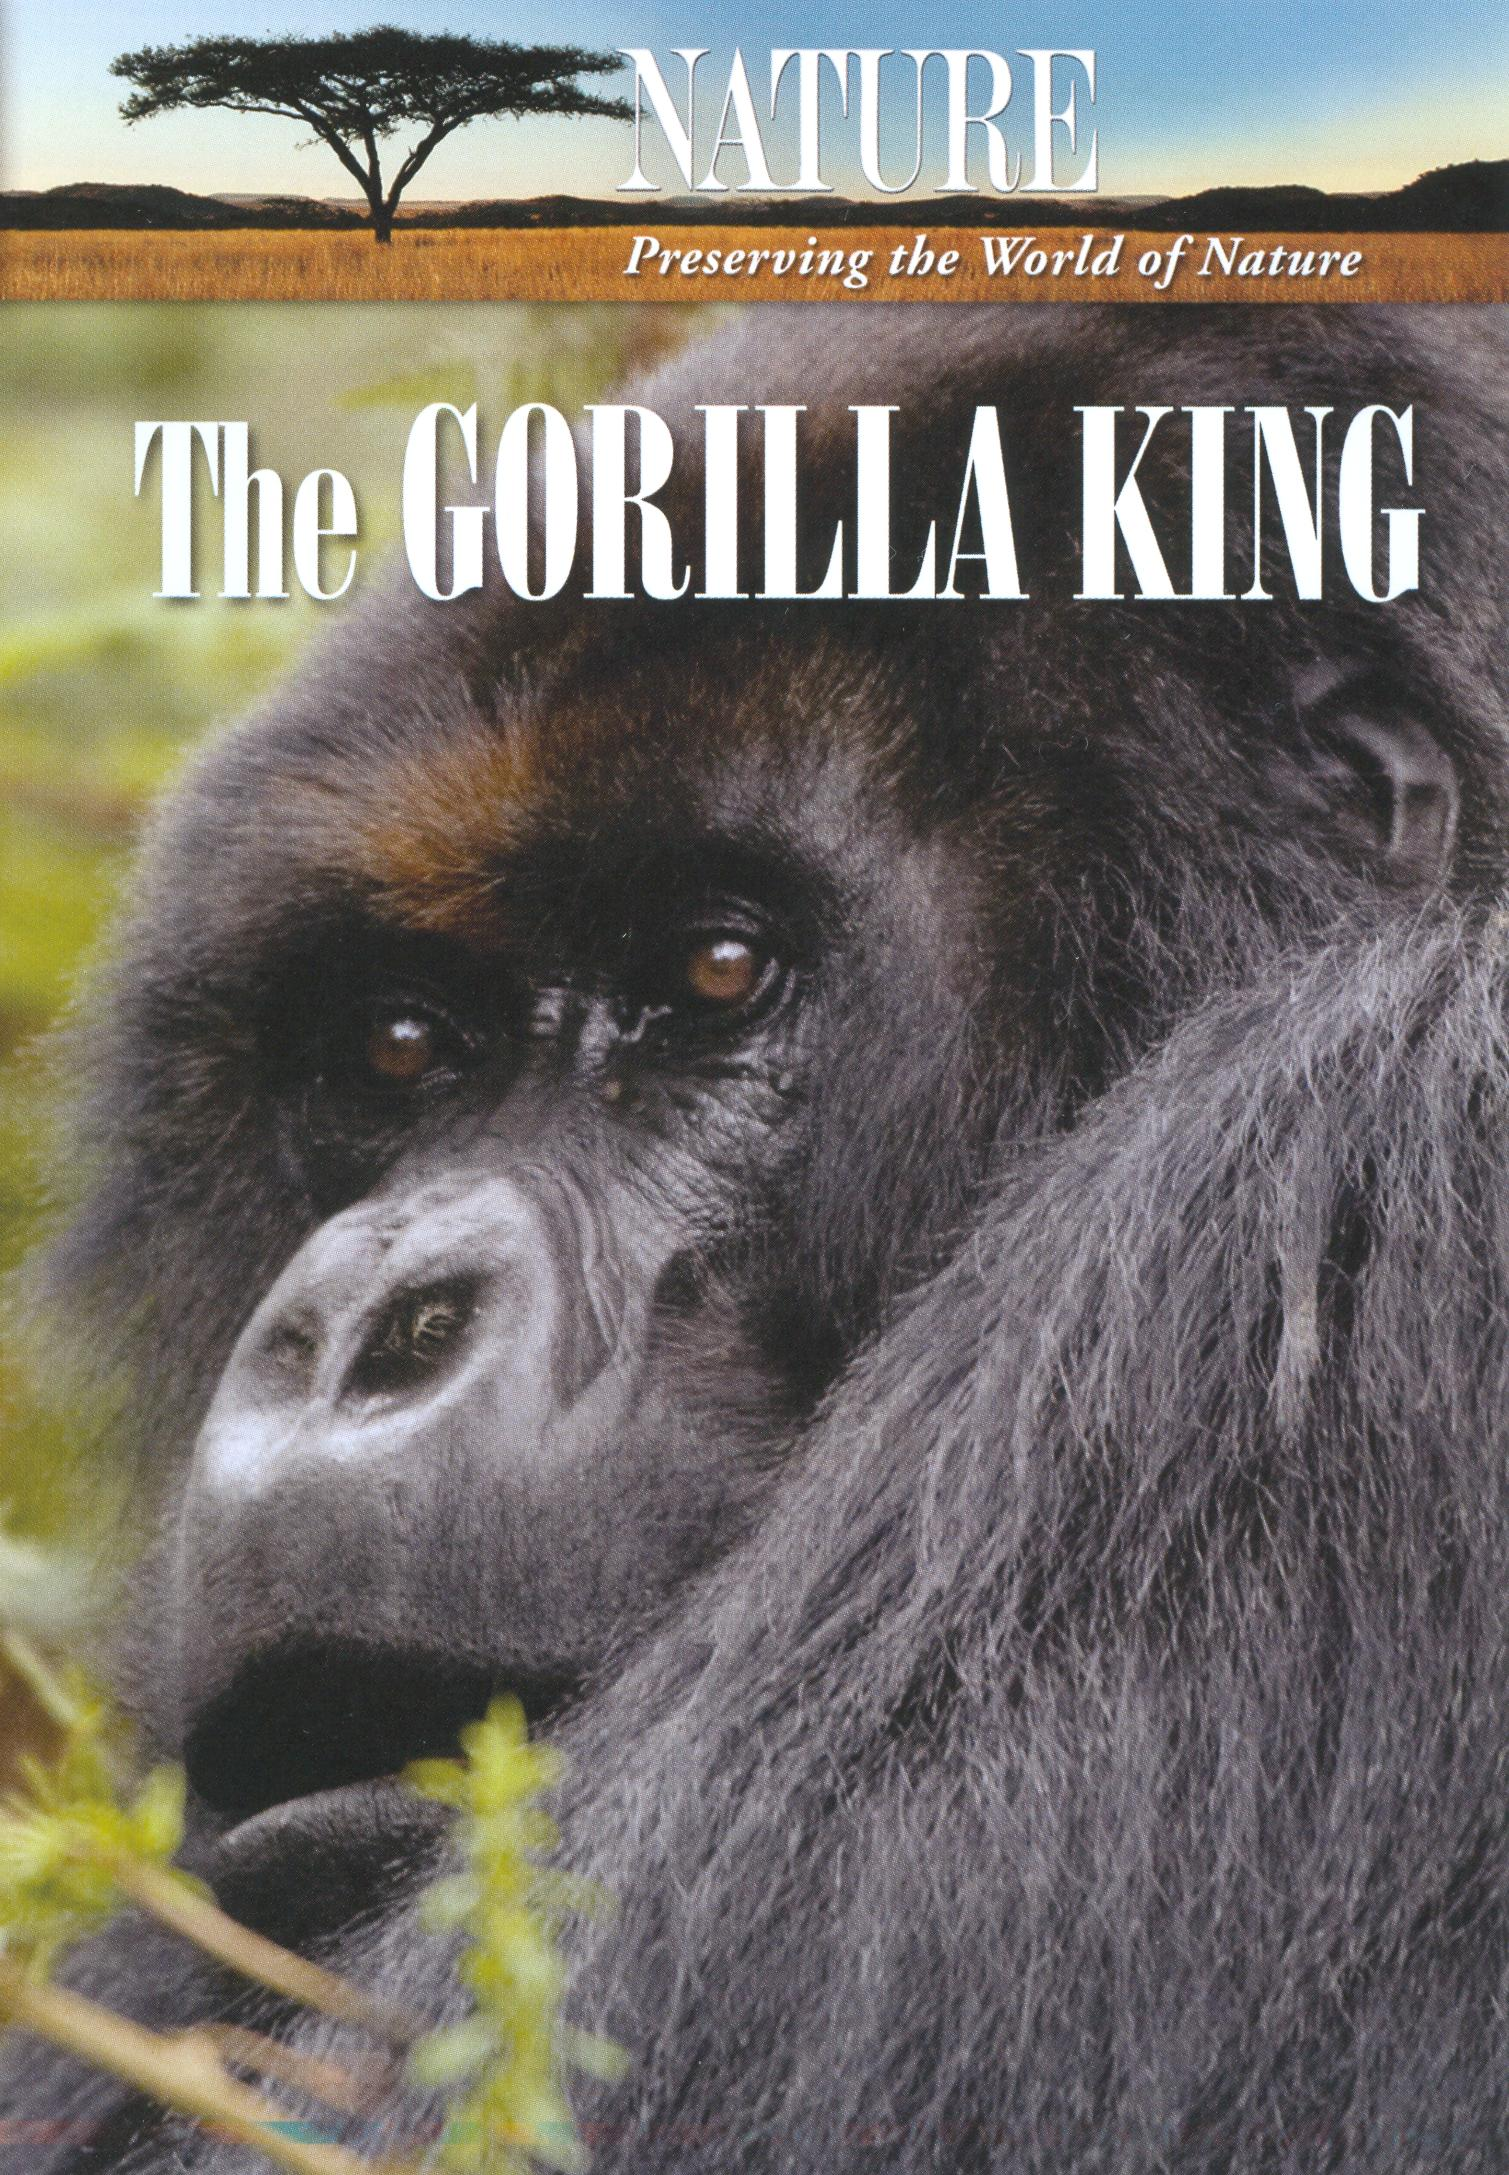 Nature: The Gorilla King